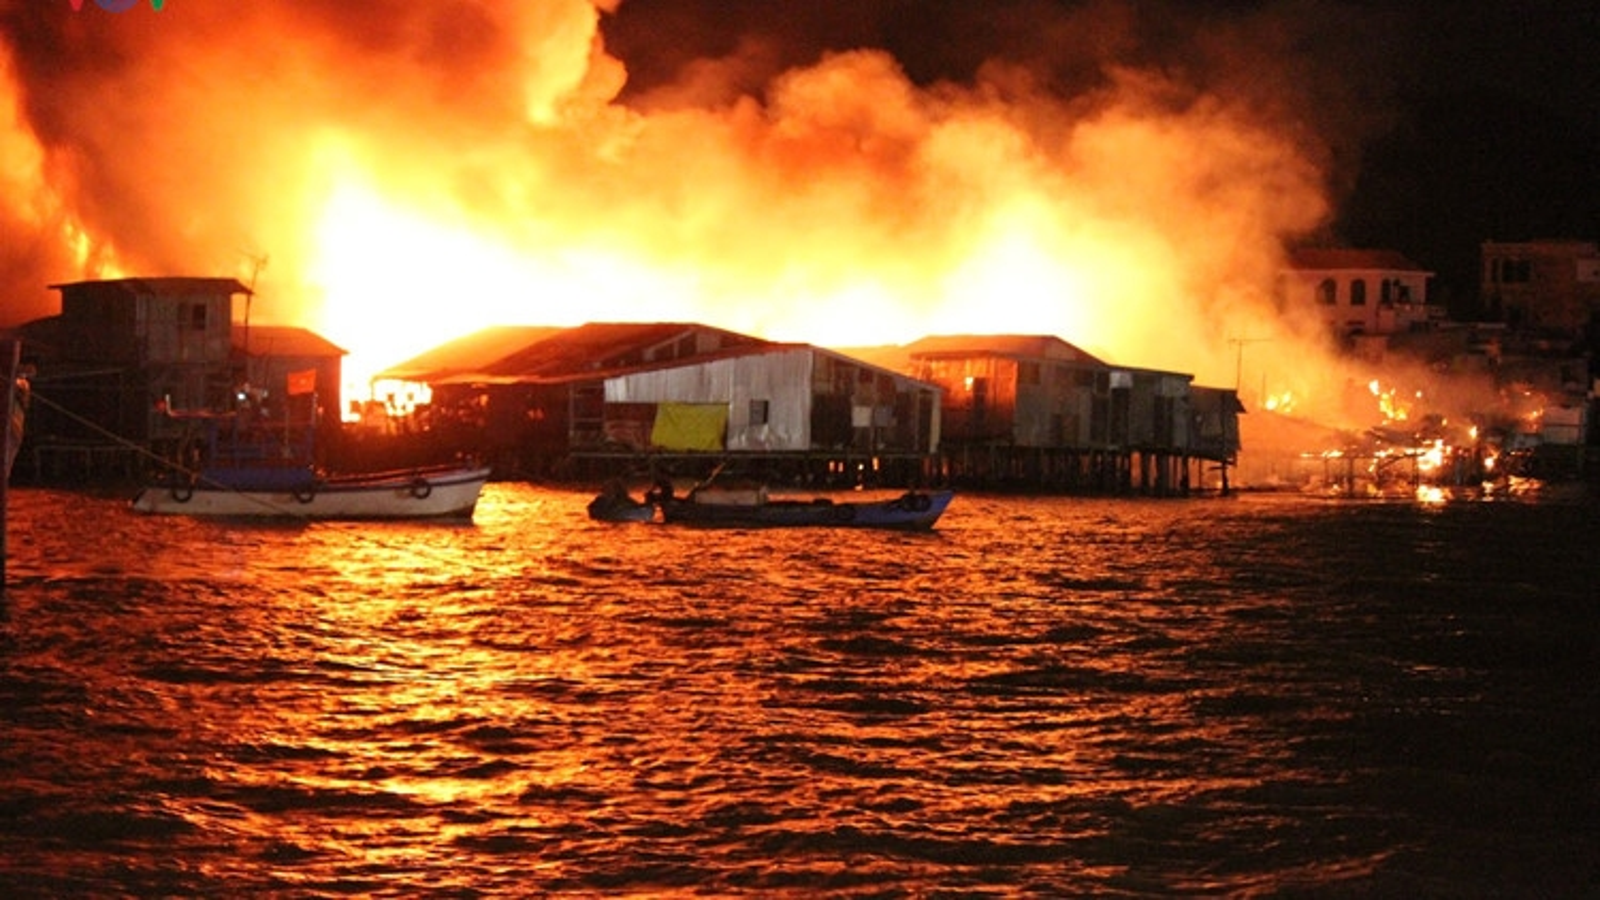 Fire destroys 70 houses in Khanh Hoa